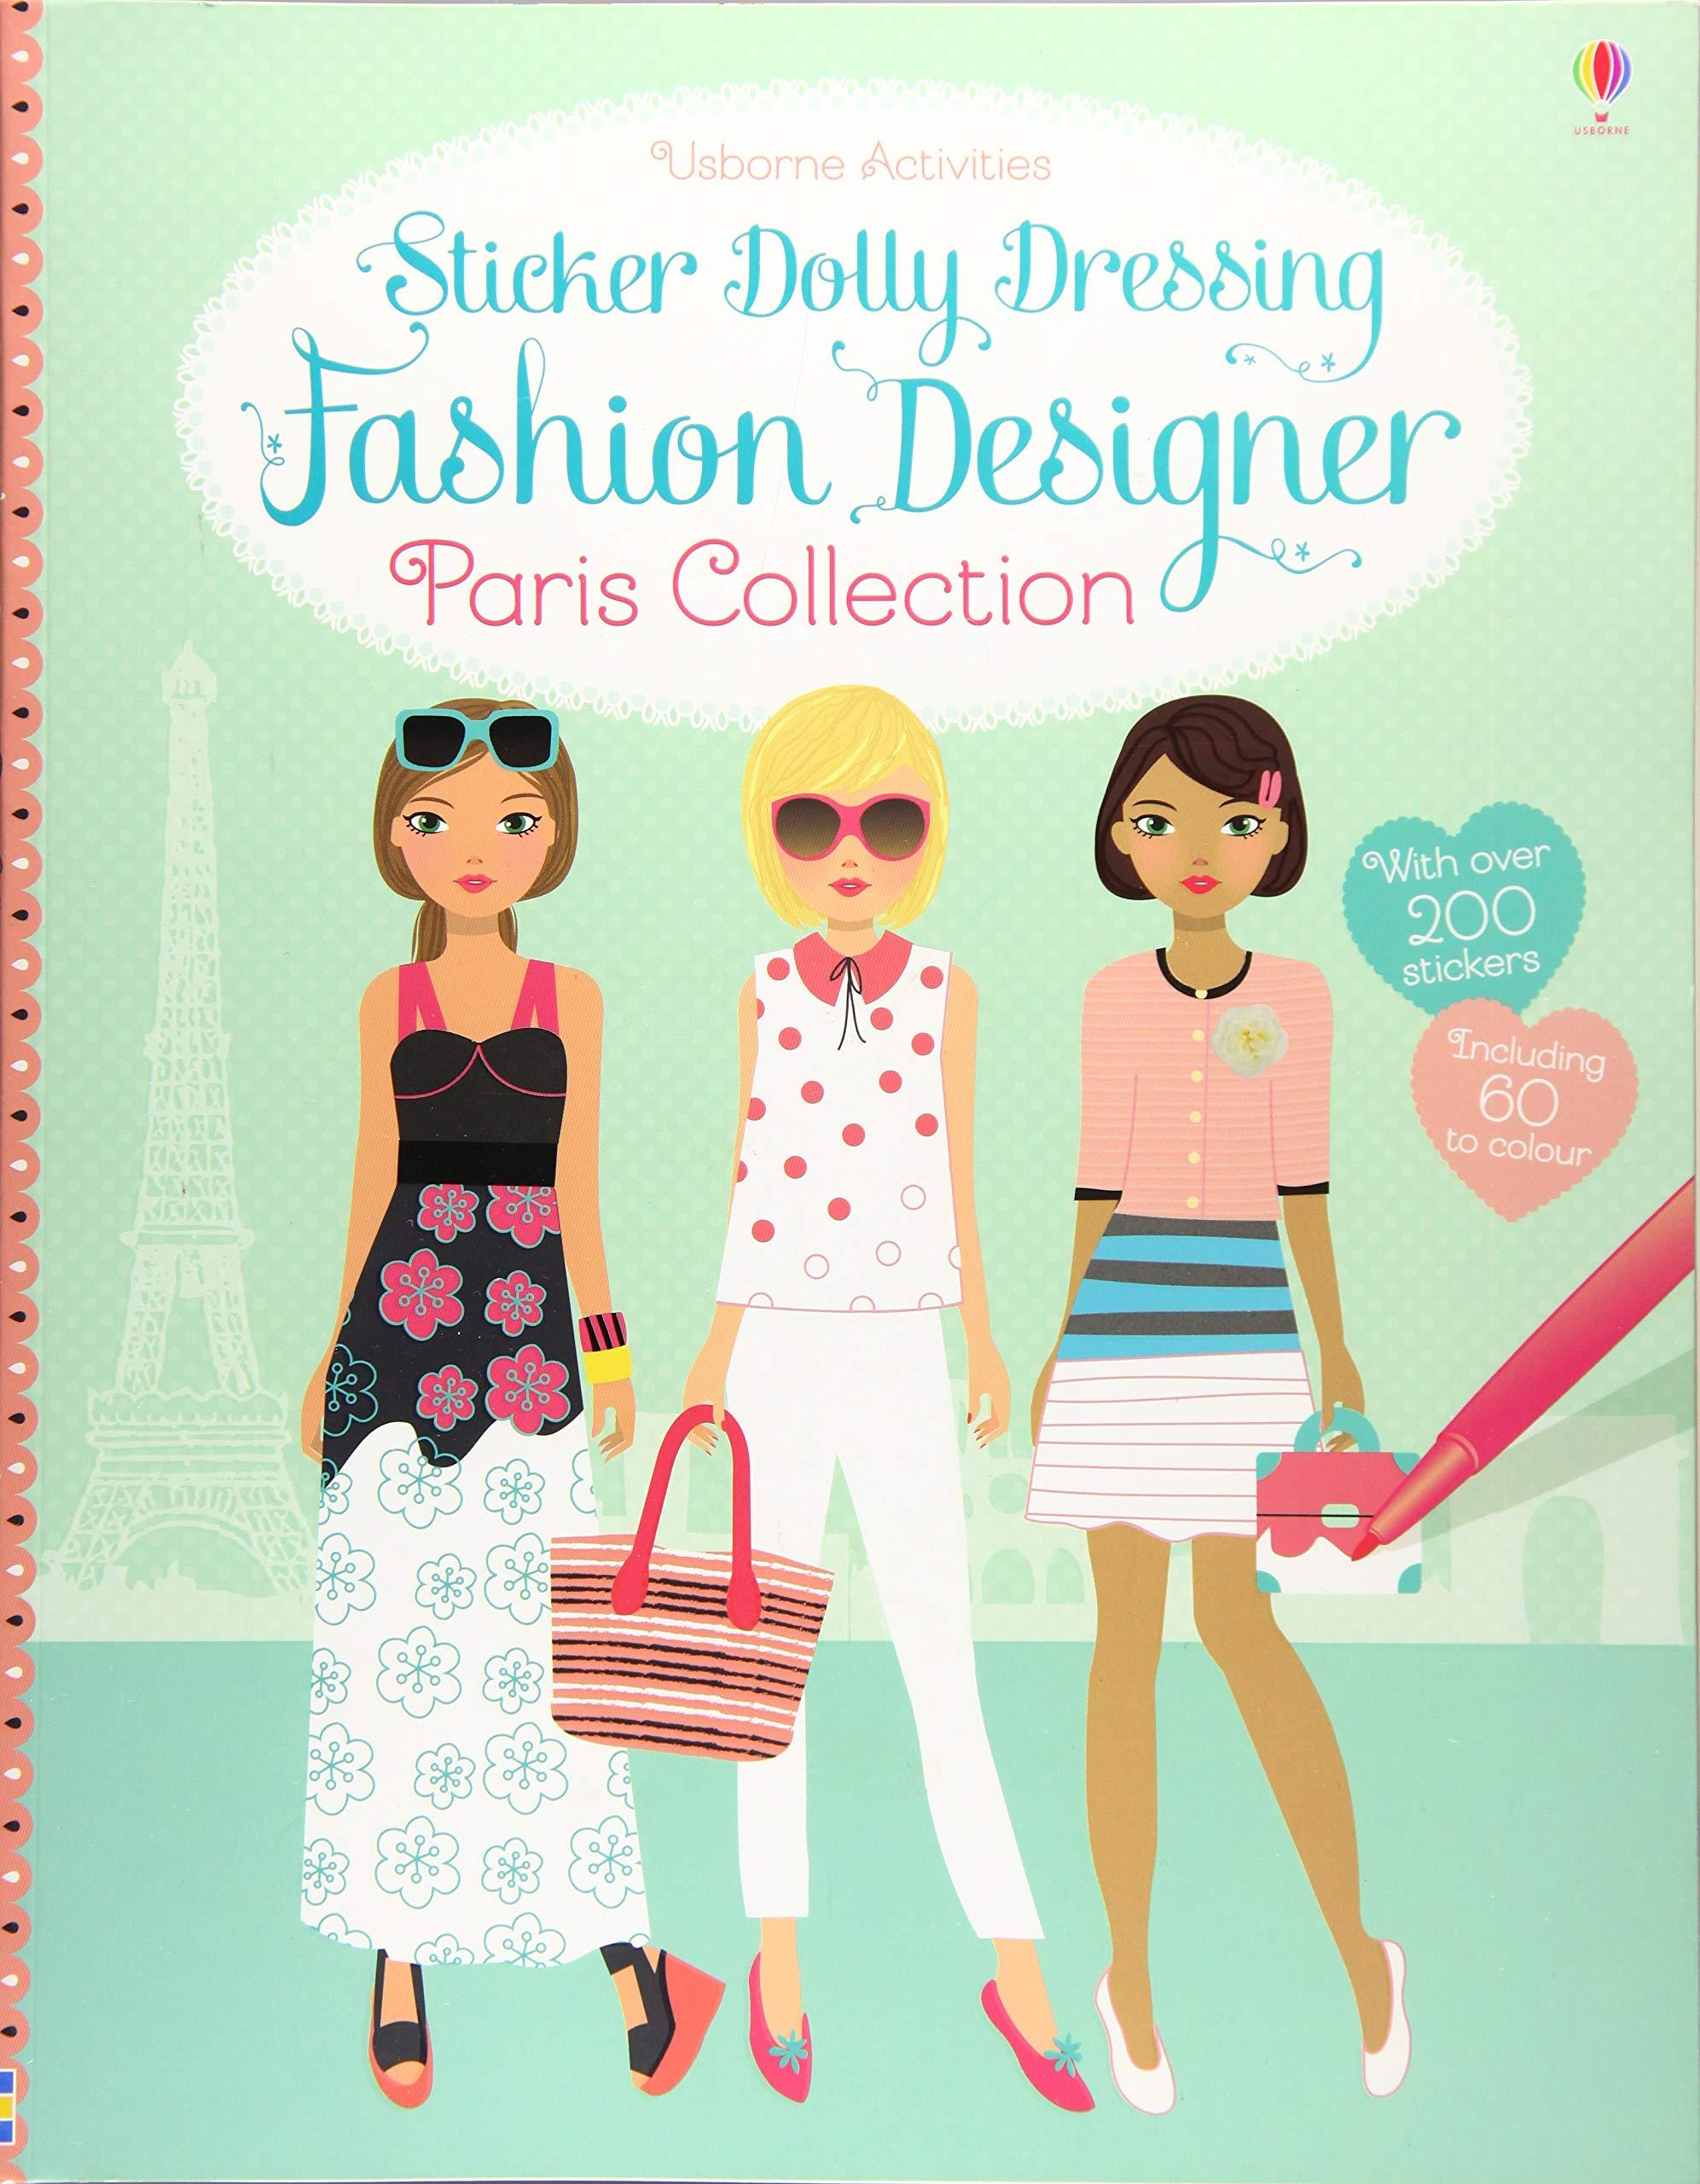 Sticker Dolly Dressing Fashion Designer Fiona Watt 9781409581840 Amazon Com Books